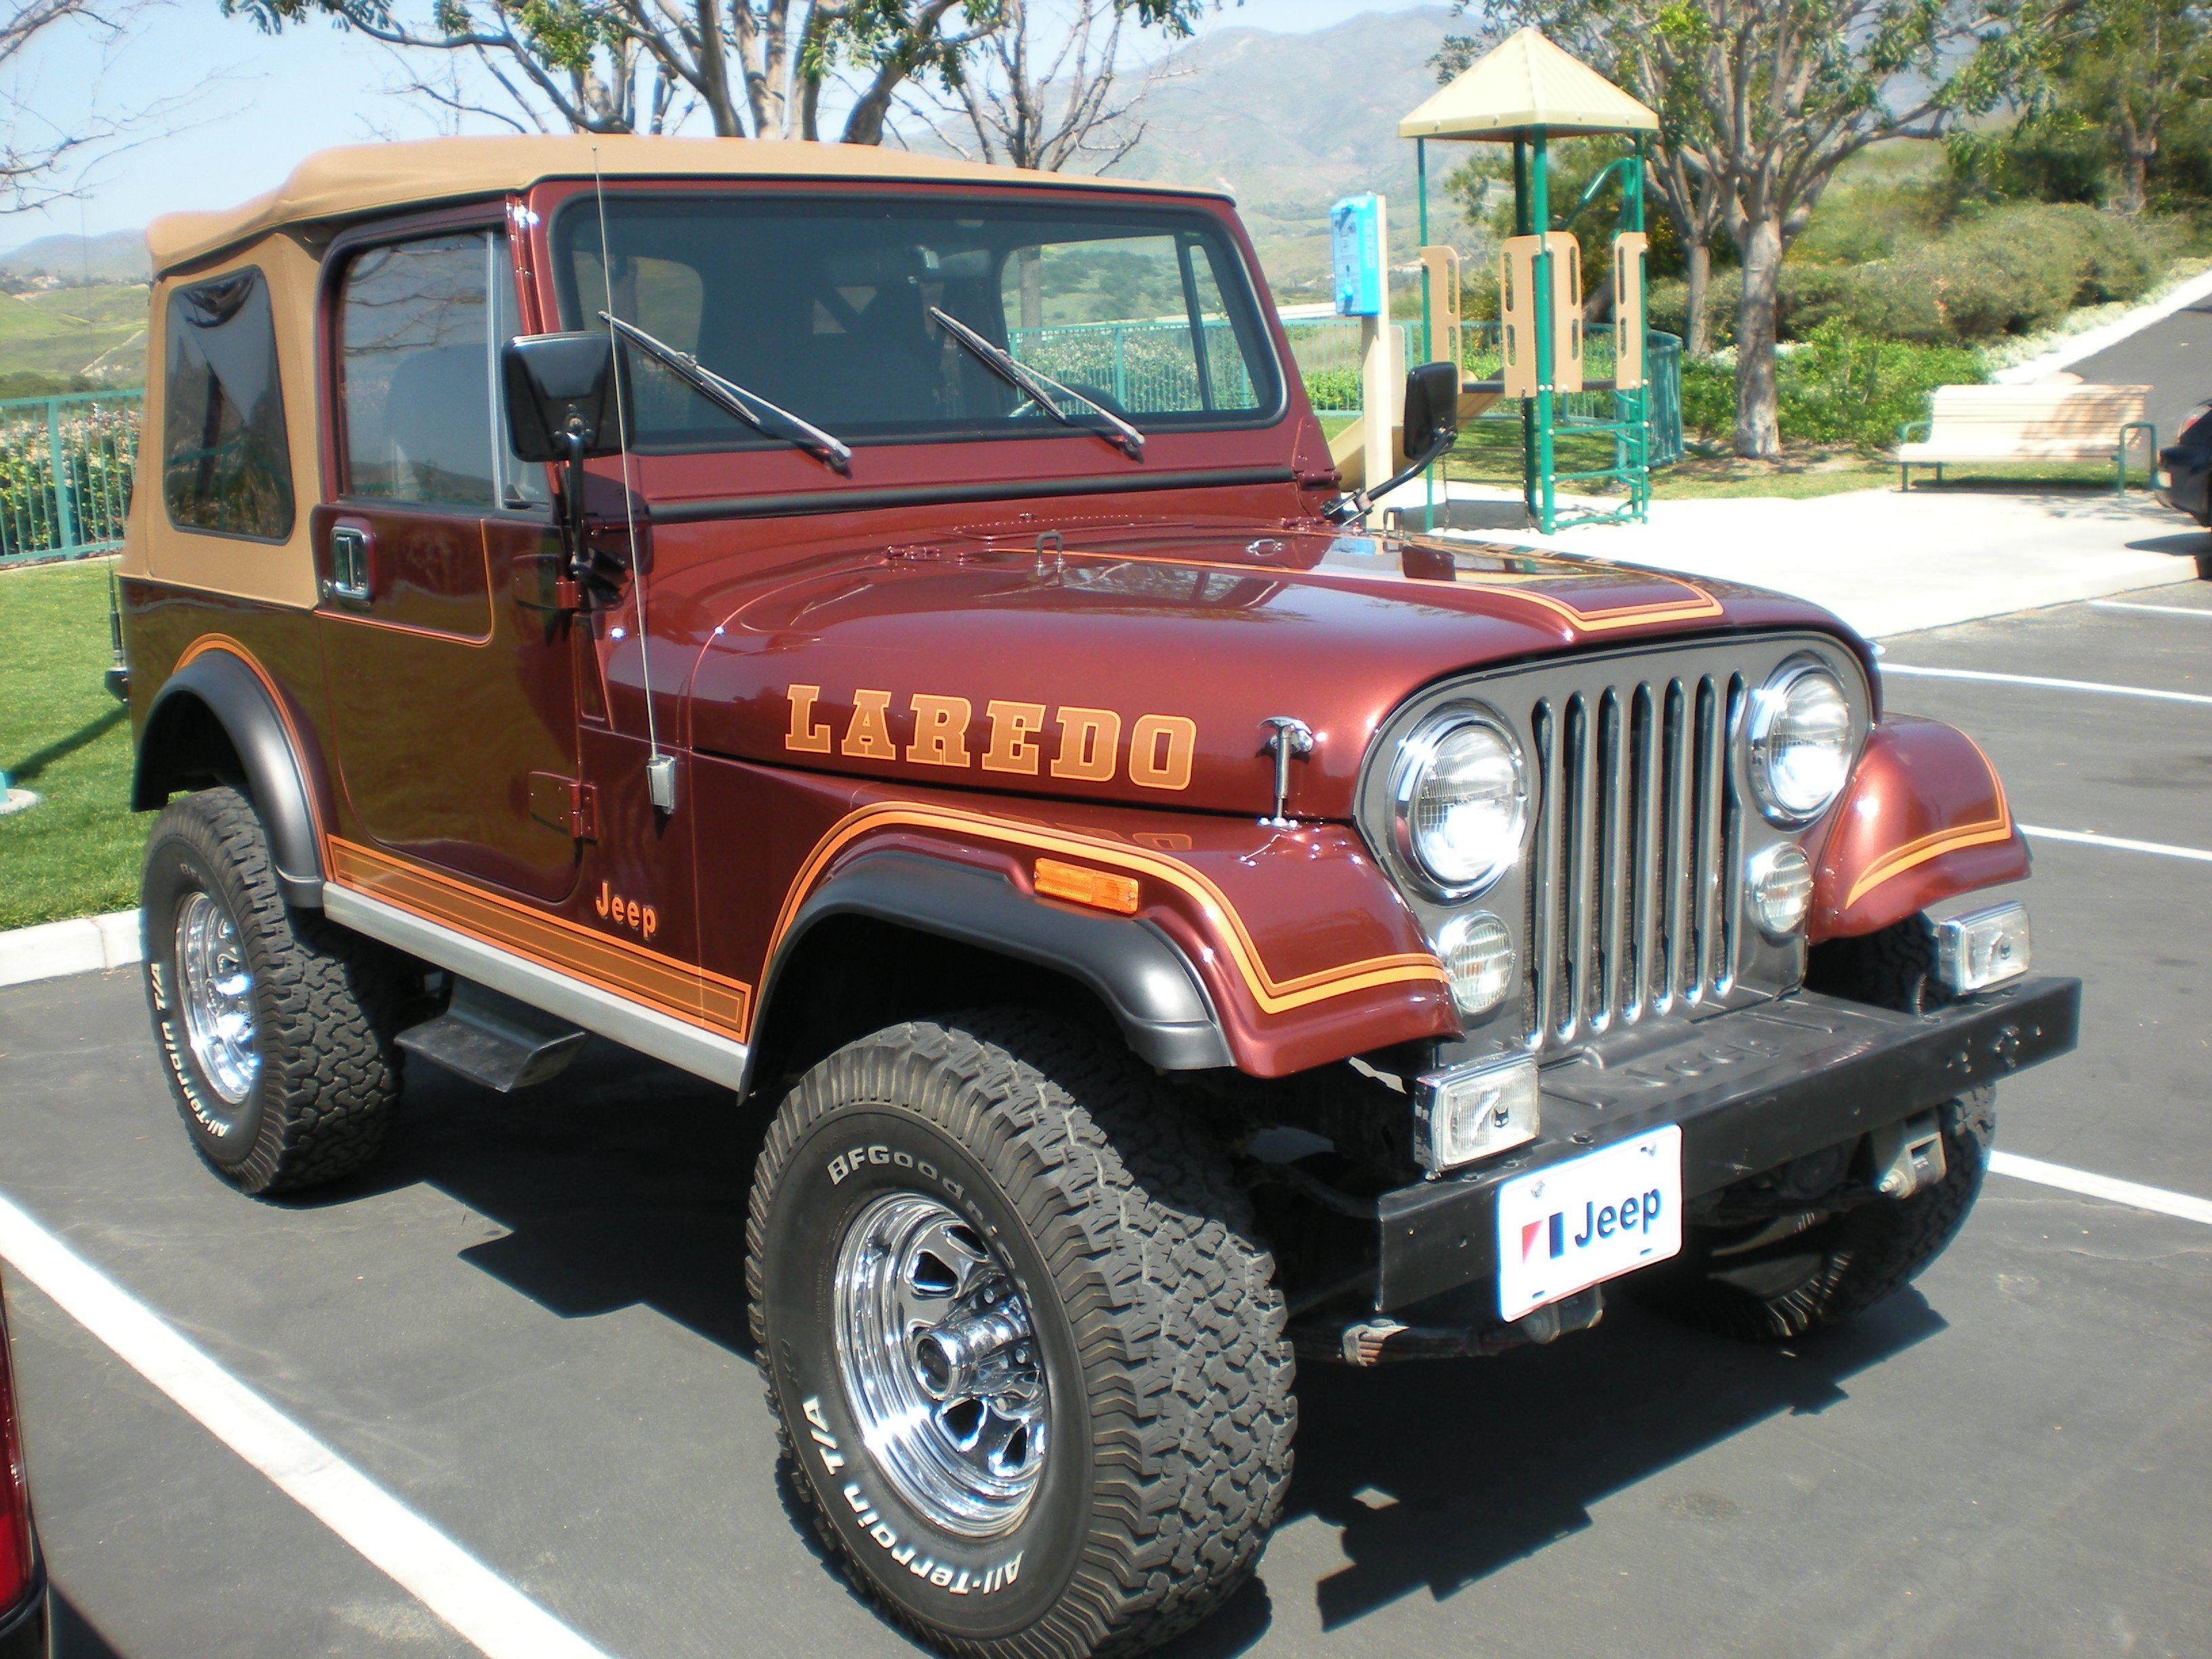 sale cj for old img jeep image description cars